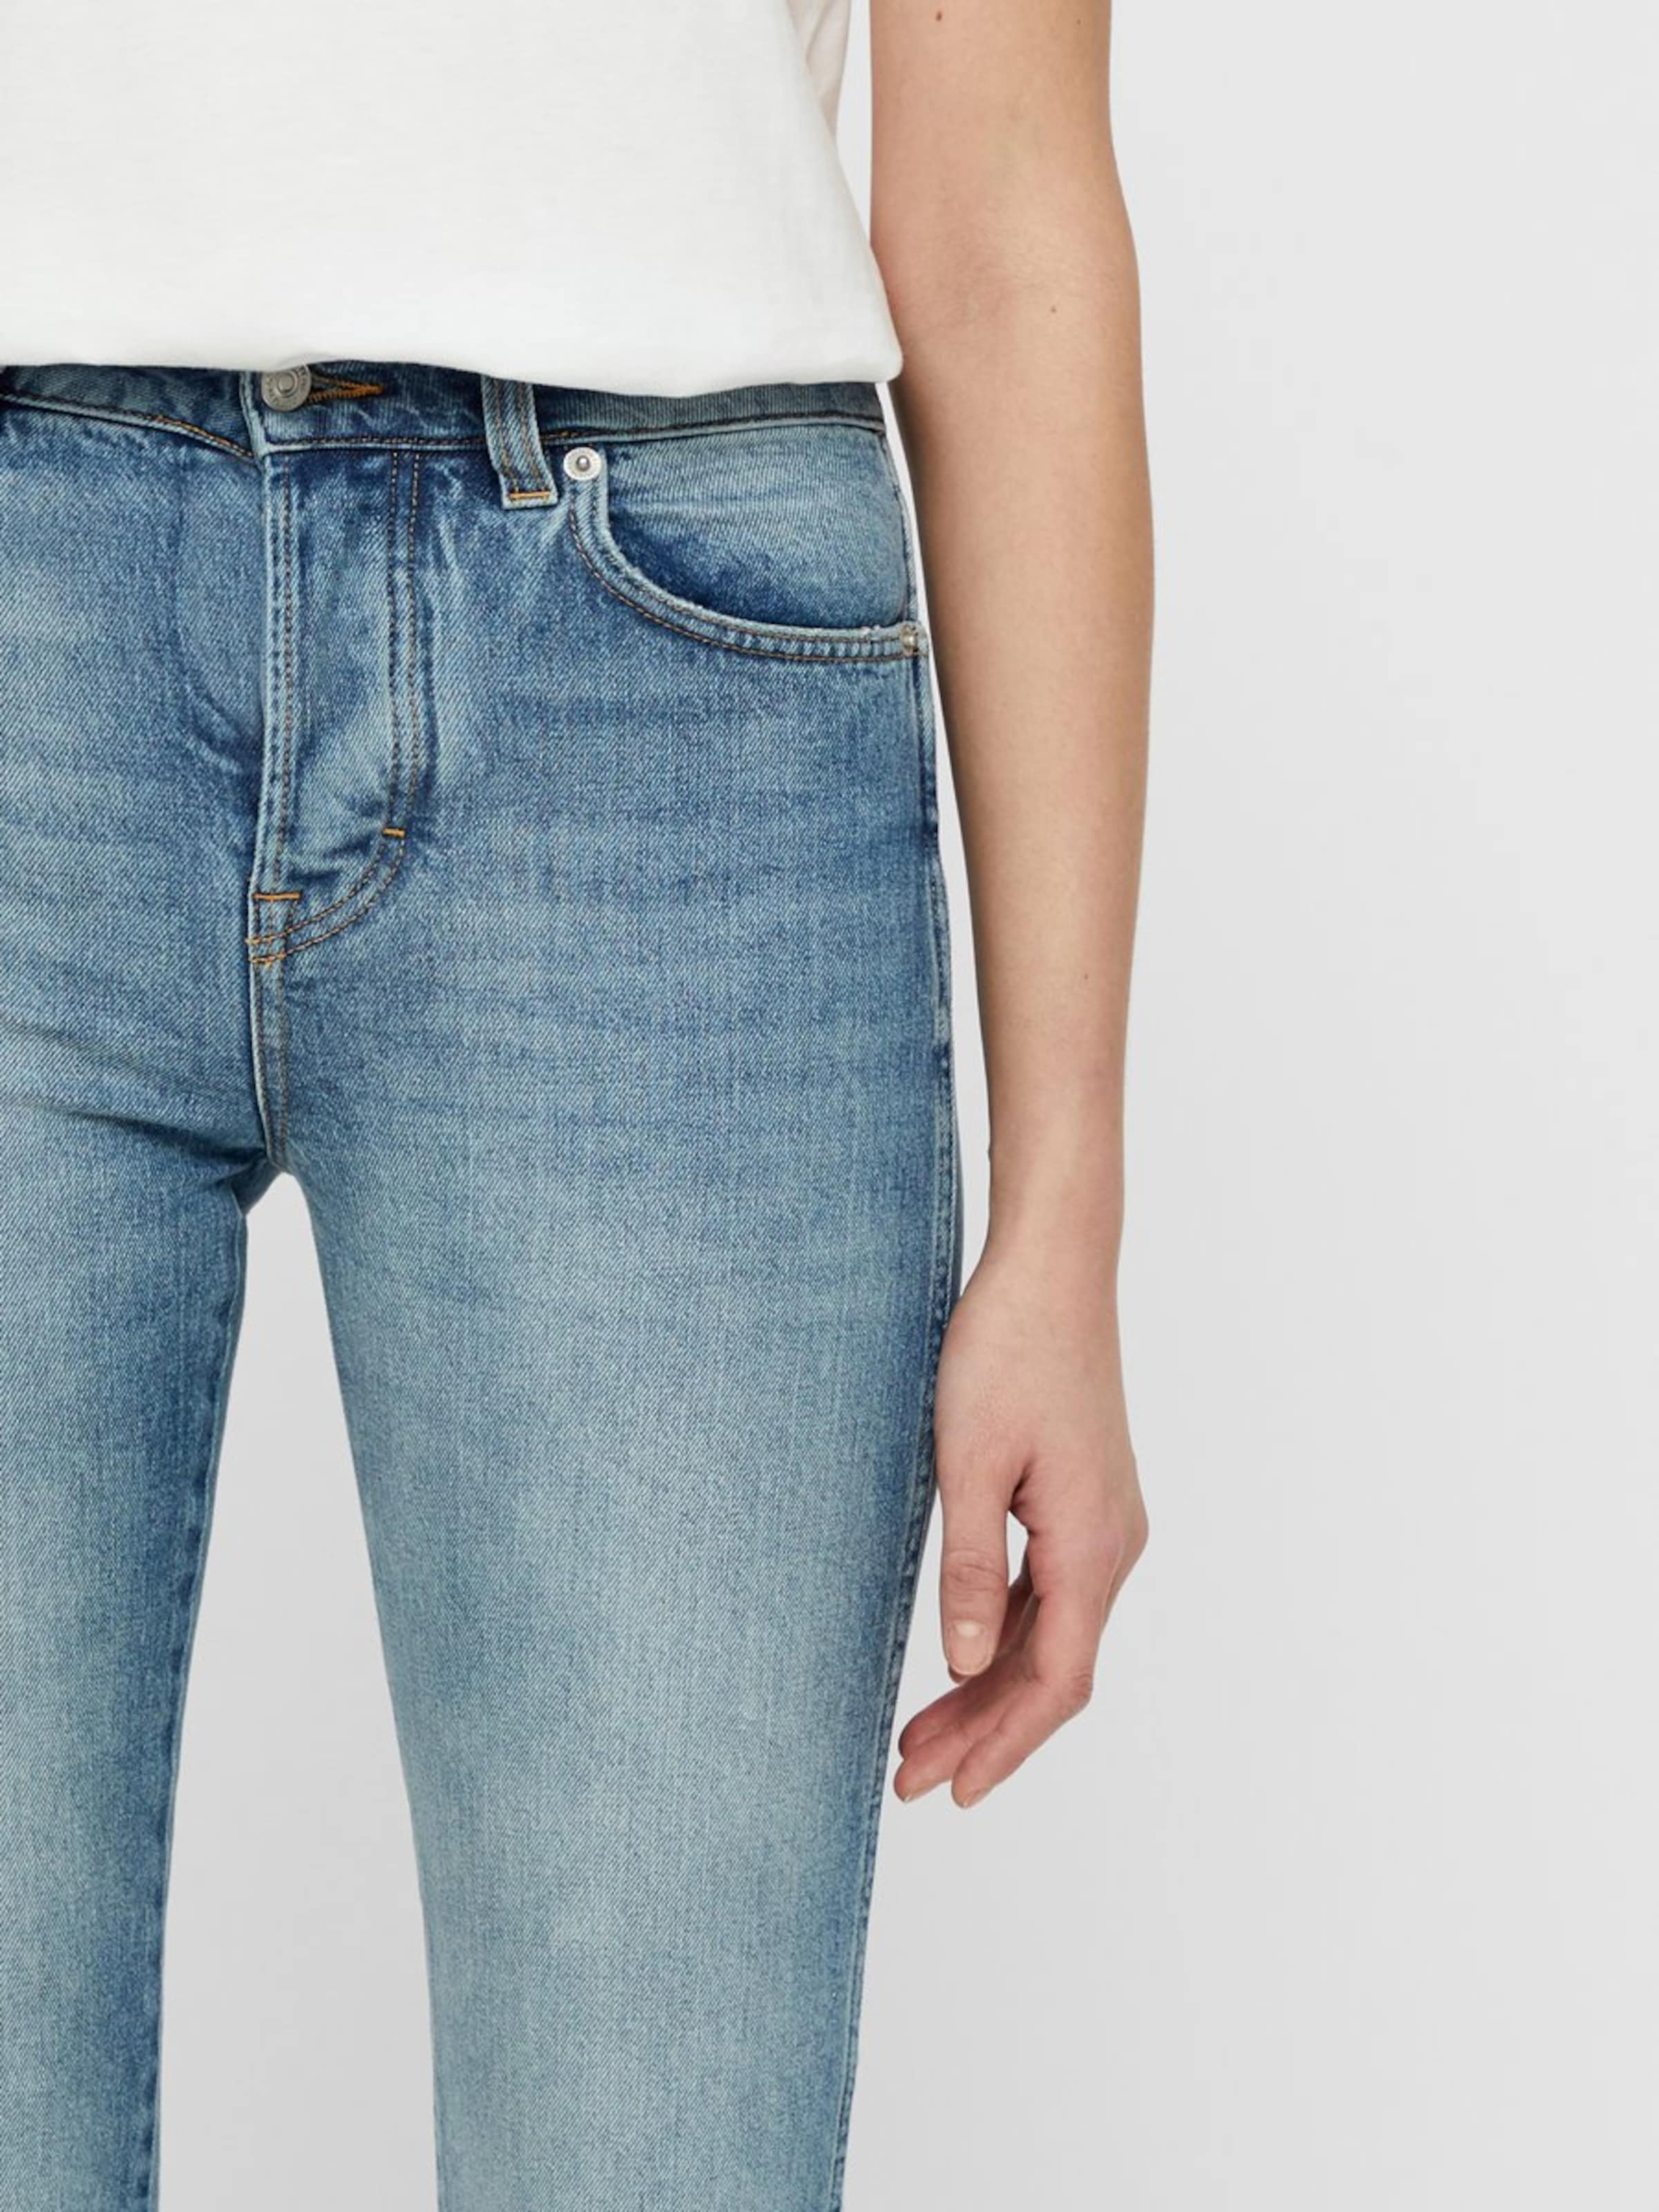 Devout' In J lindeberg Jeans 'study Denim Blue kwPXZuOiT